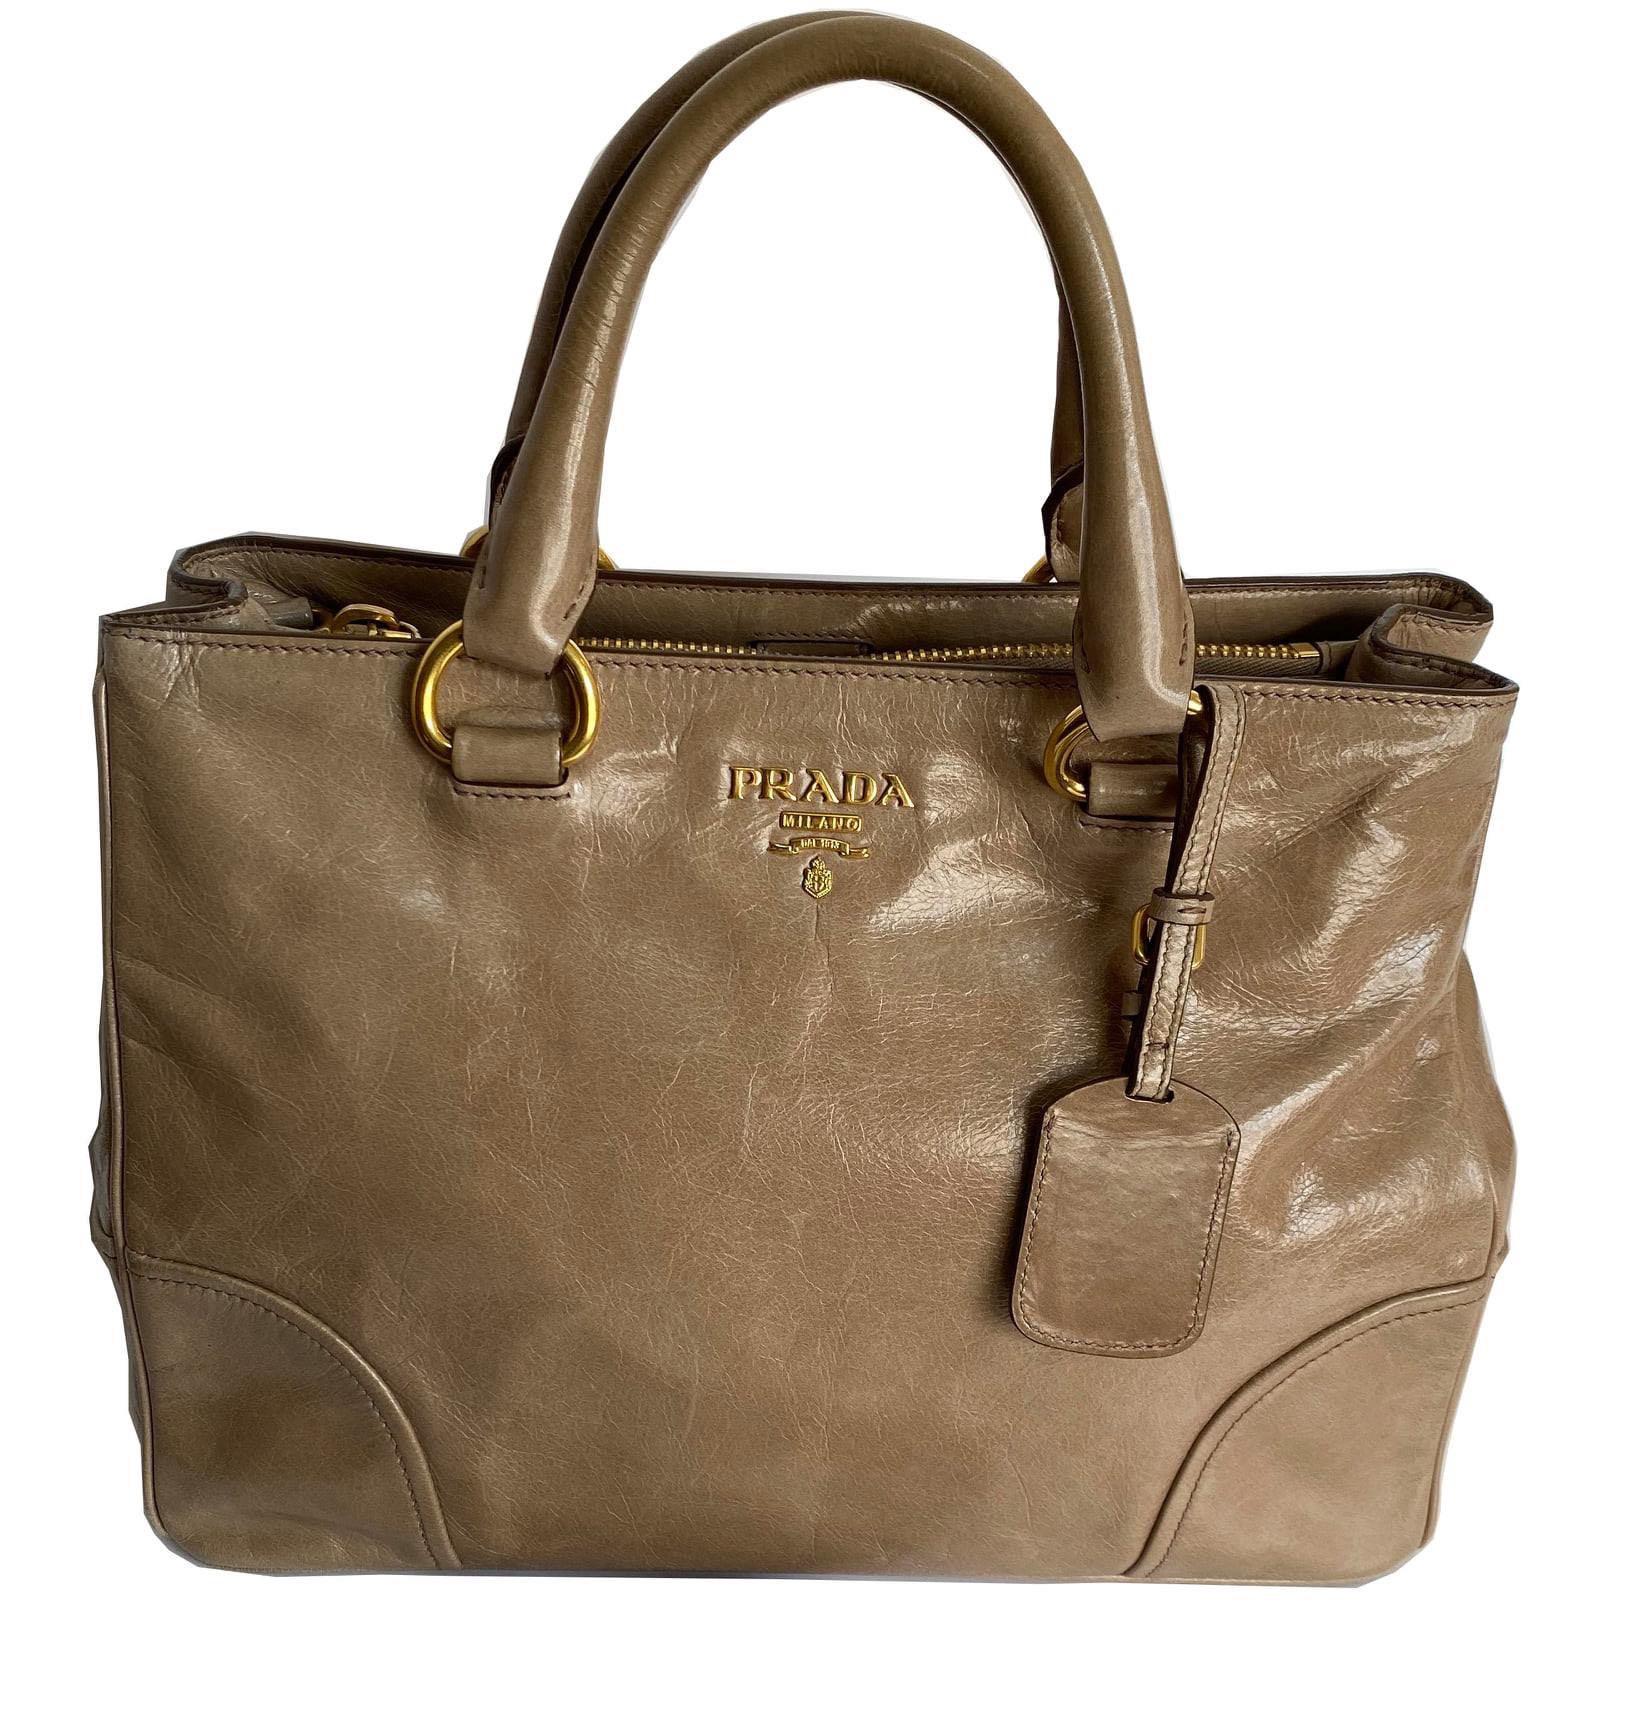 Prada vitellio shine tote bag. 100% real. 90% new